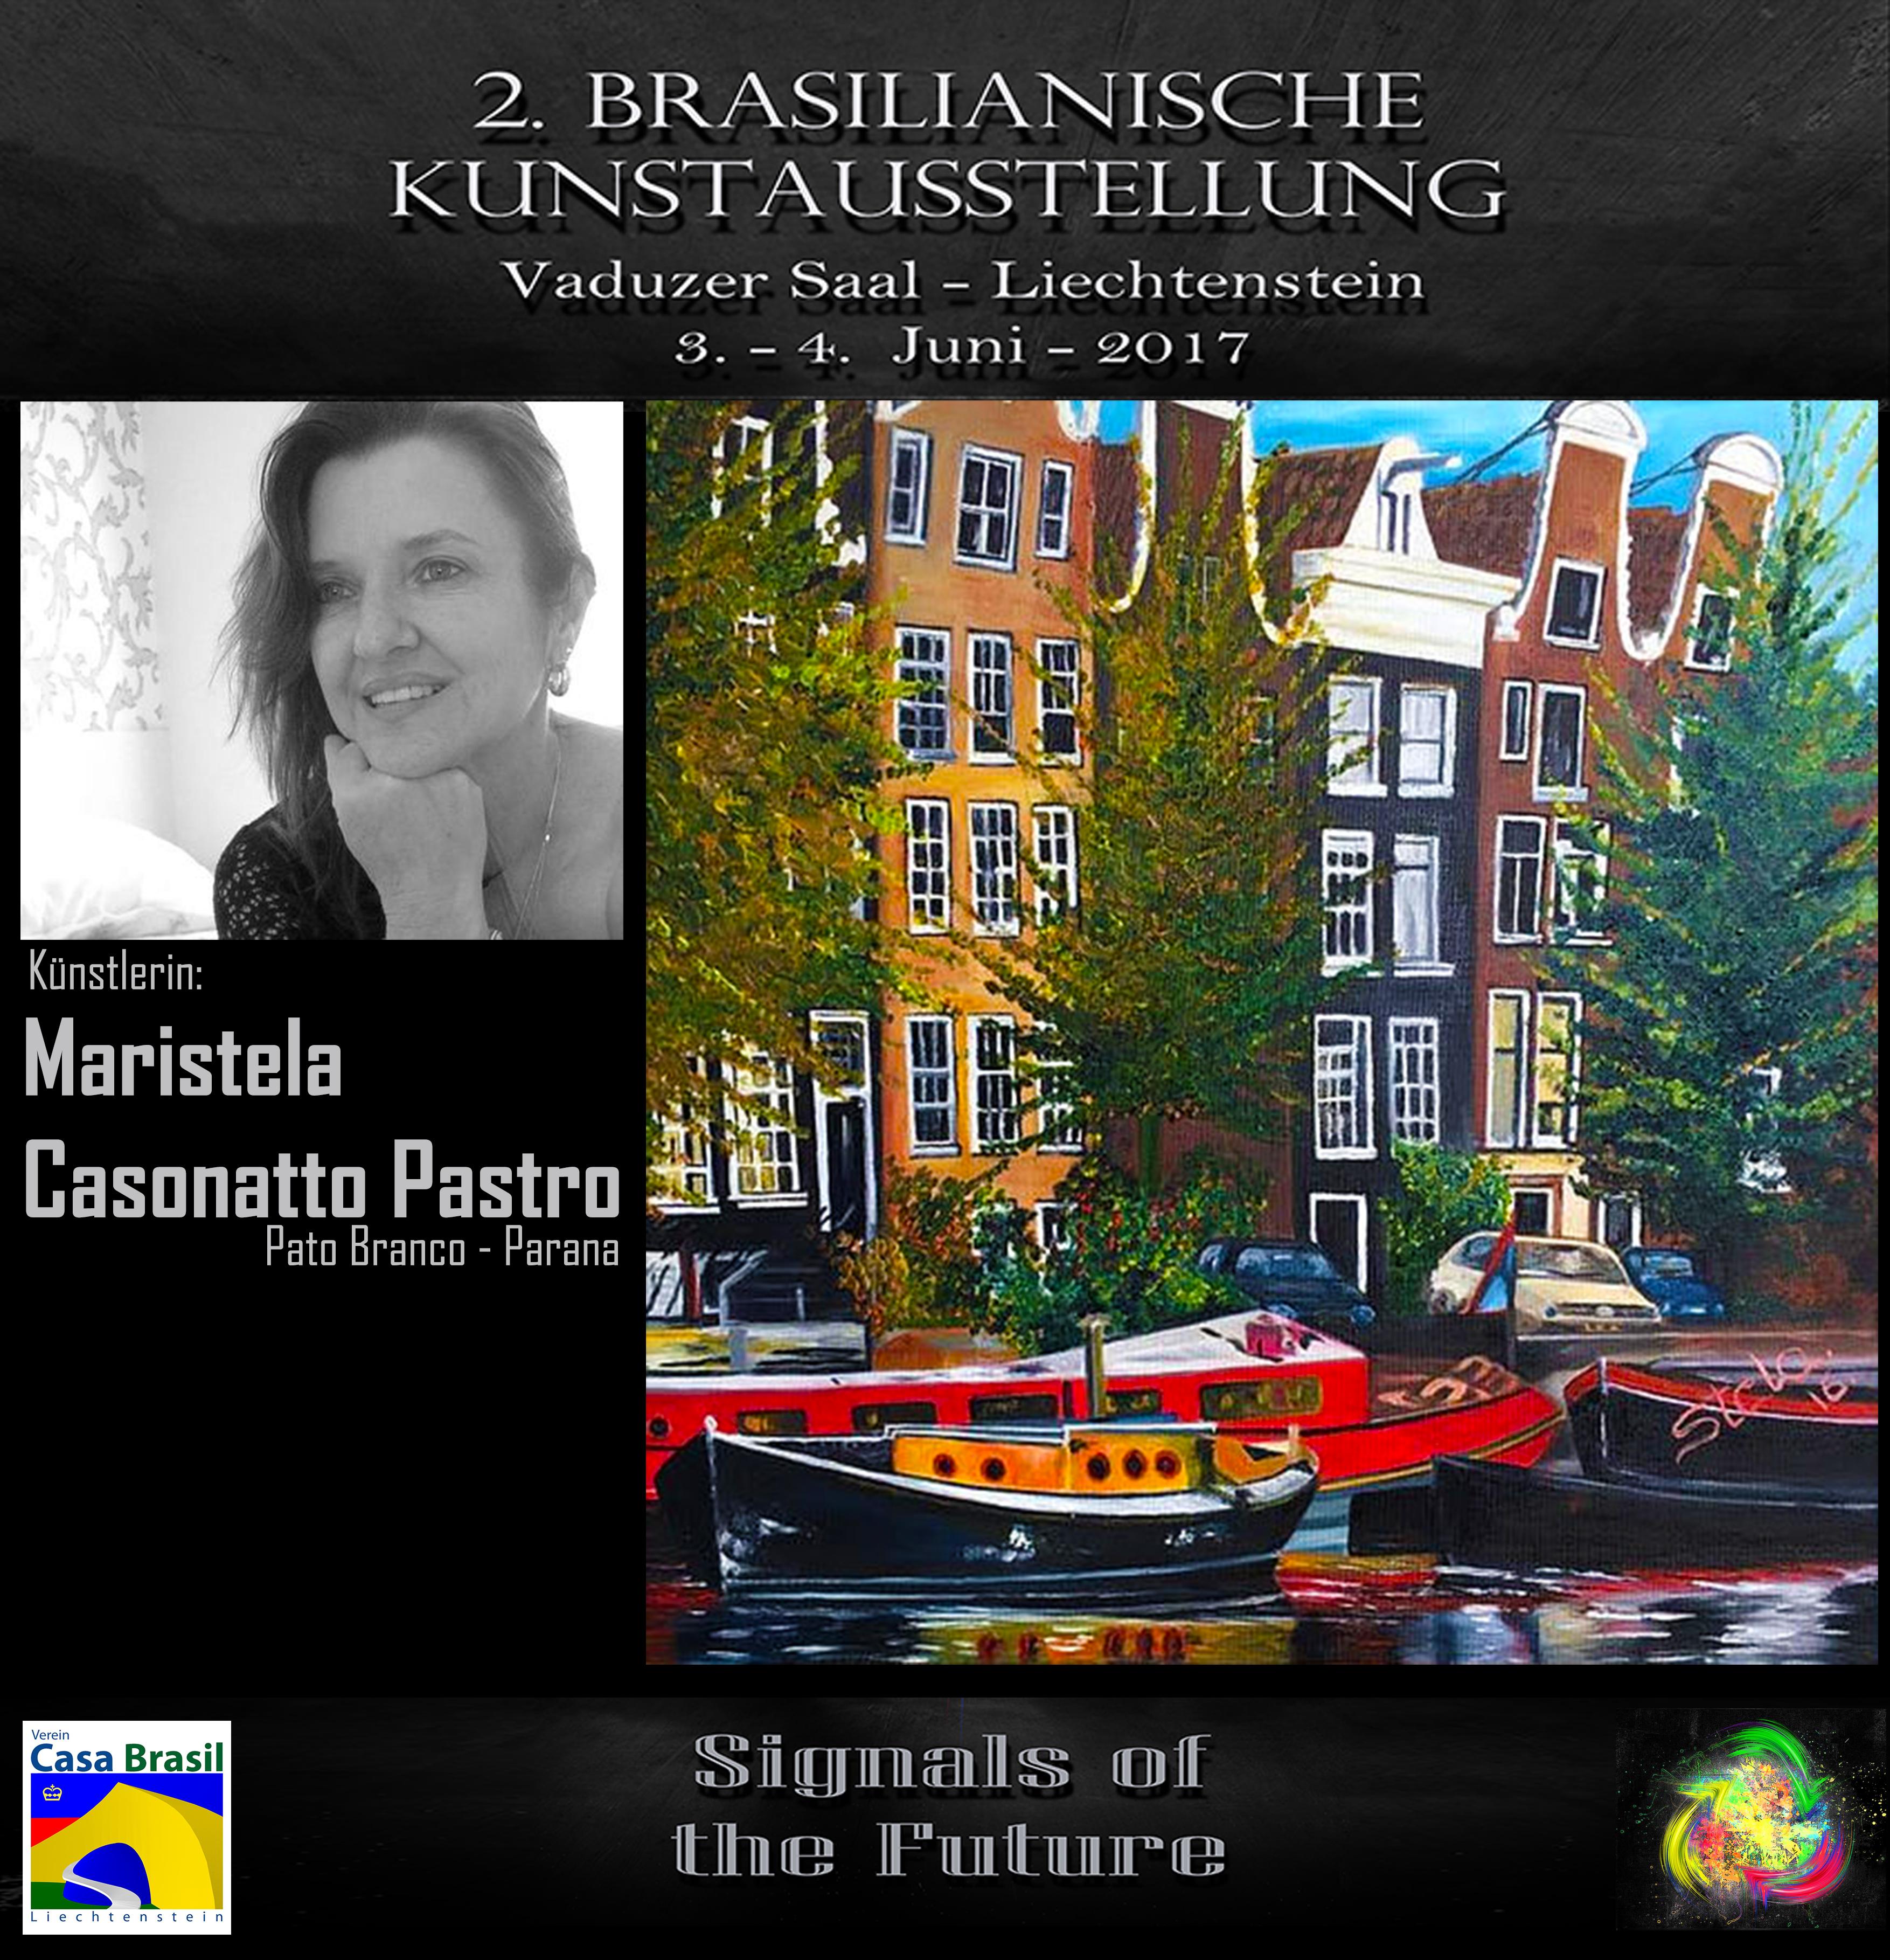 Maristela Casonatto Pastro